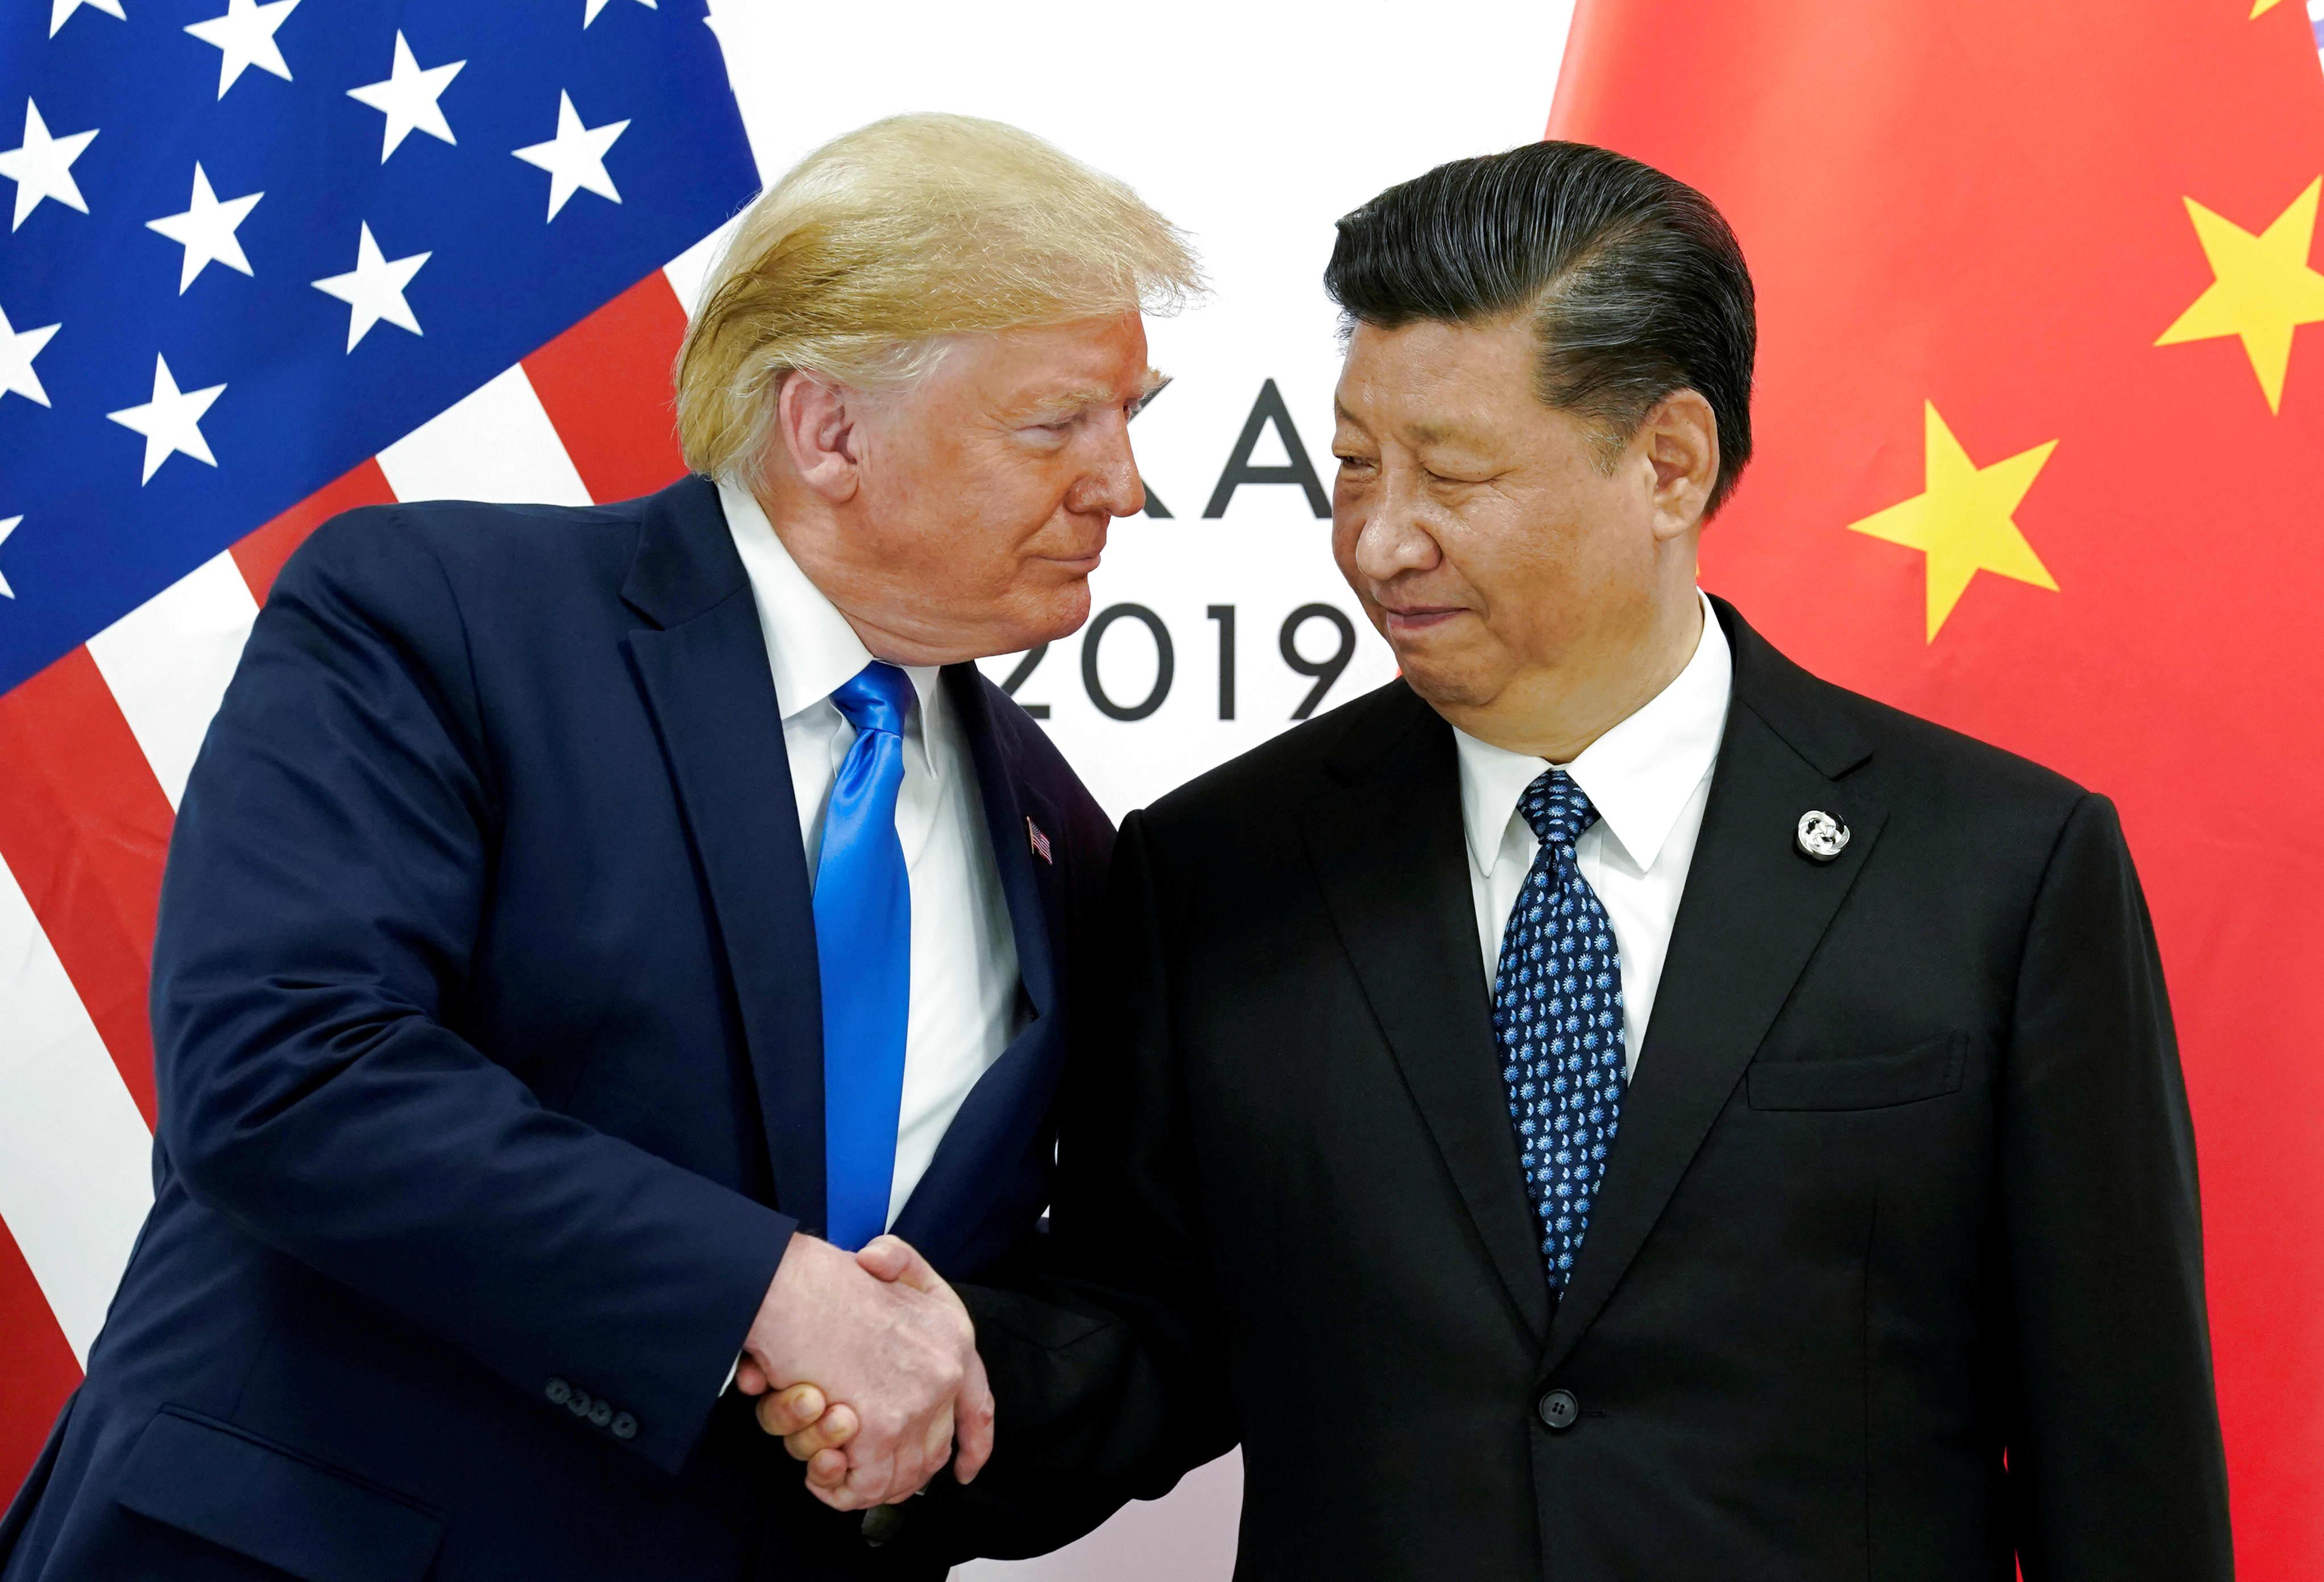 Trump on China: '100 Trade Deals' wouldn't make up for coronavirus